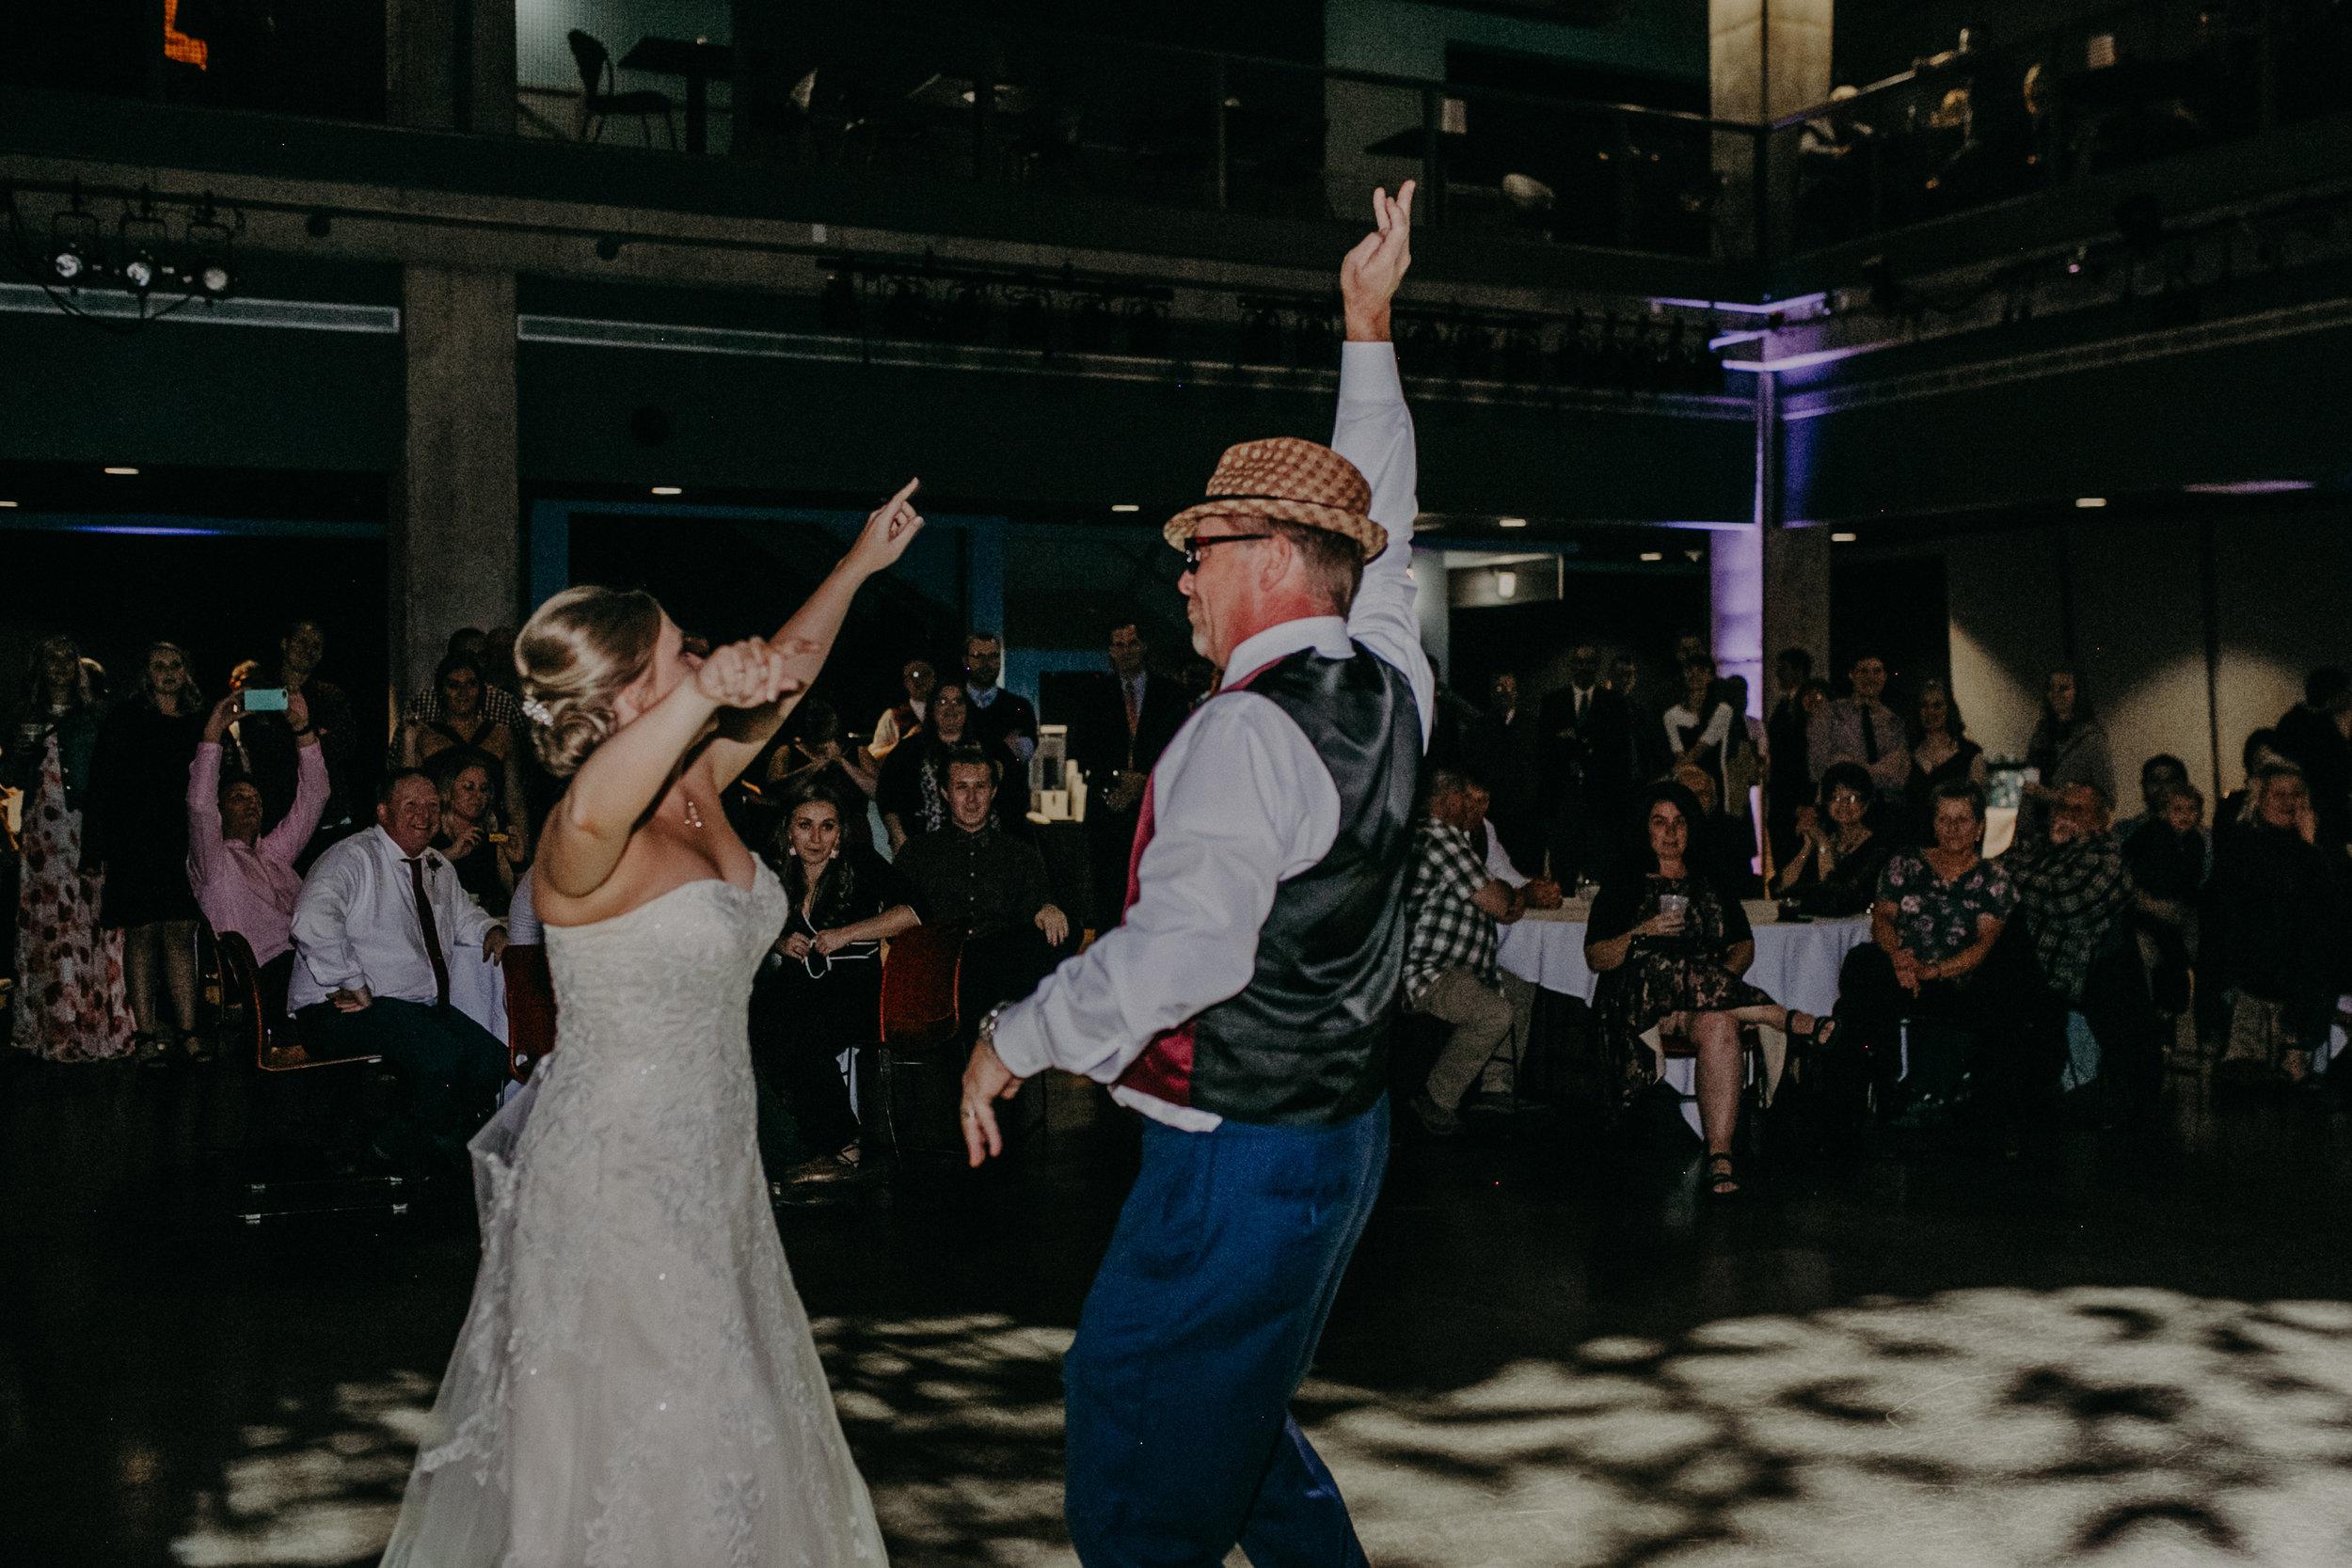 Weisenbeck_Wedding_Oct2018-756.jpg